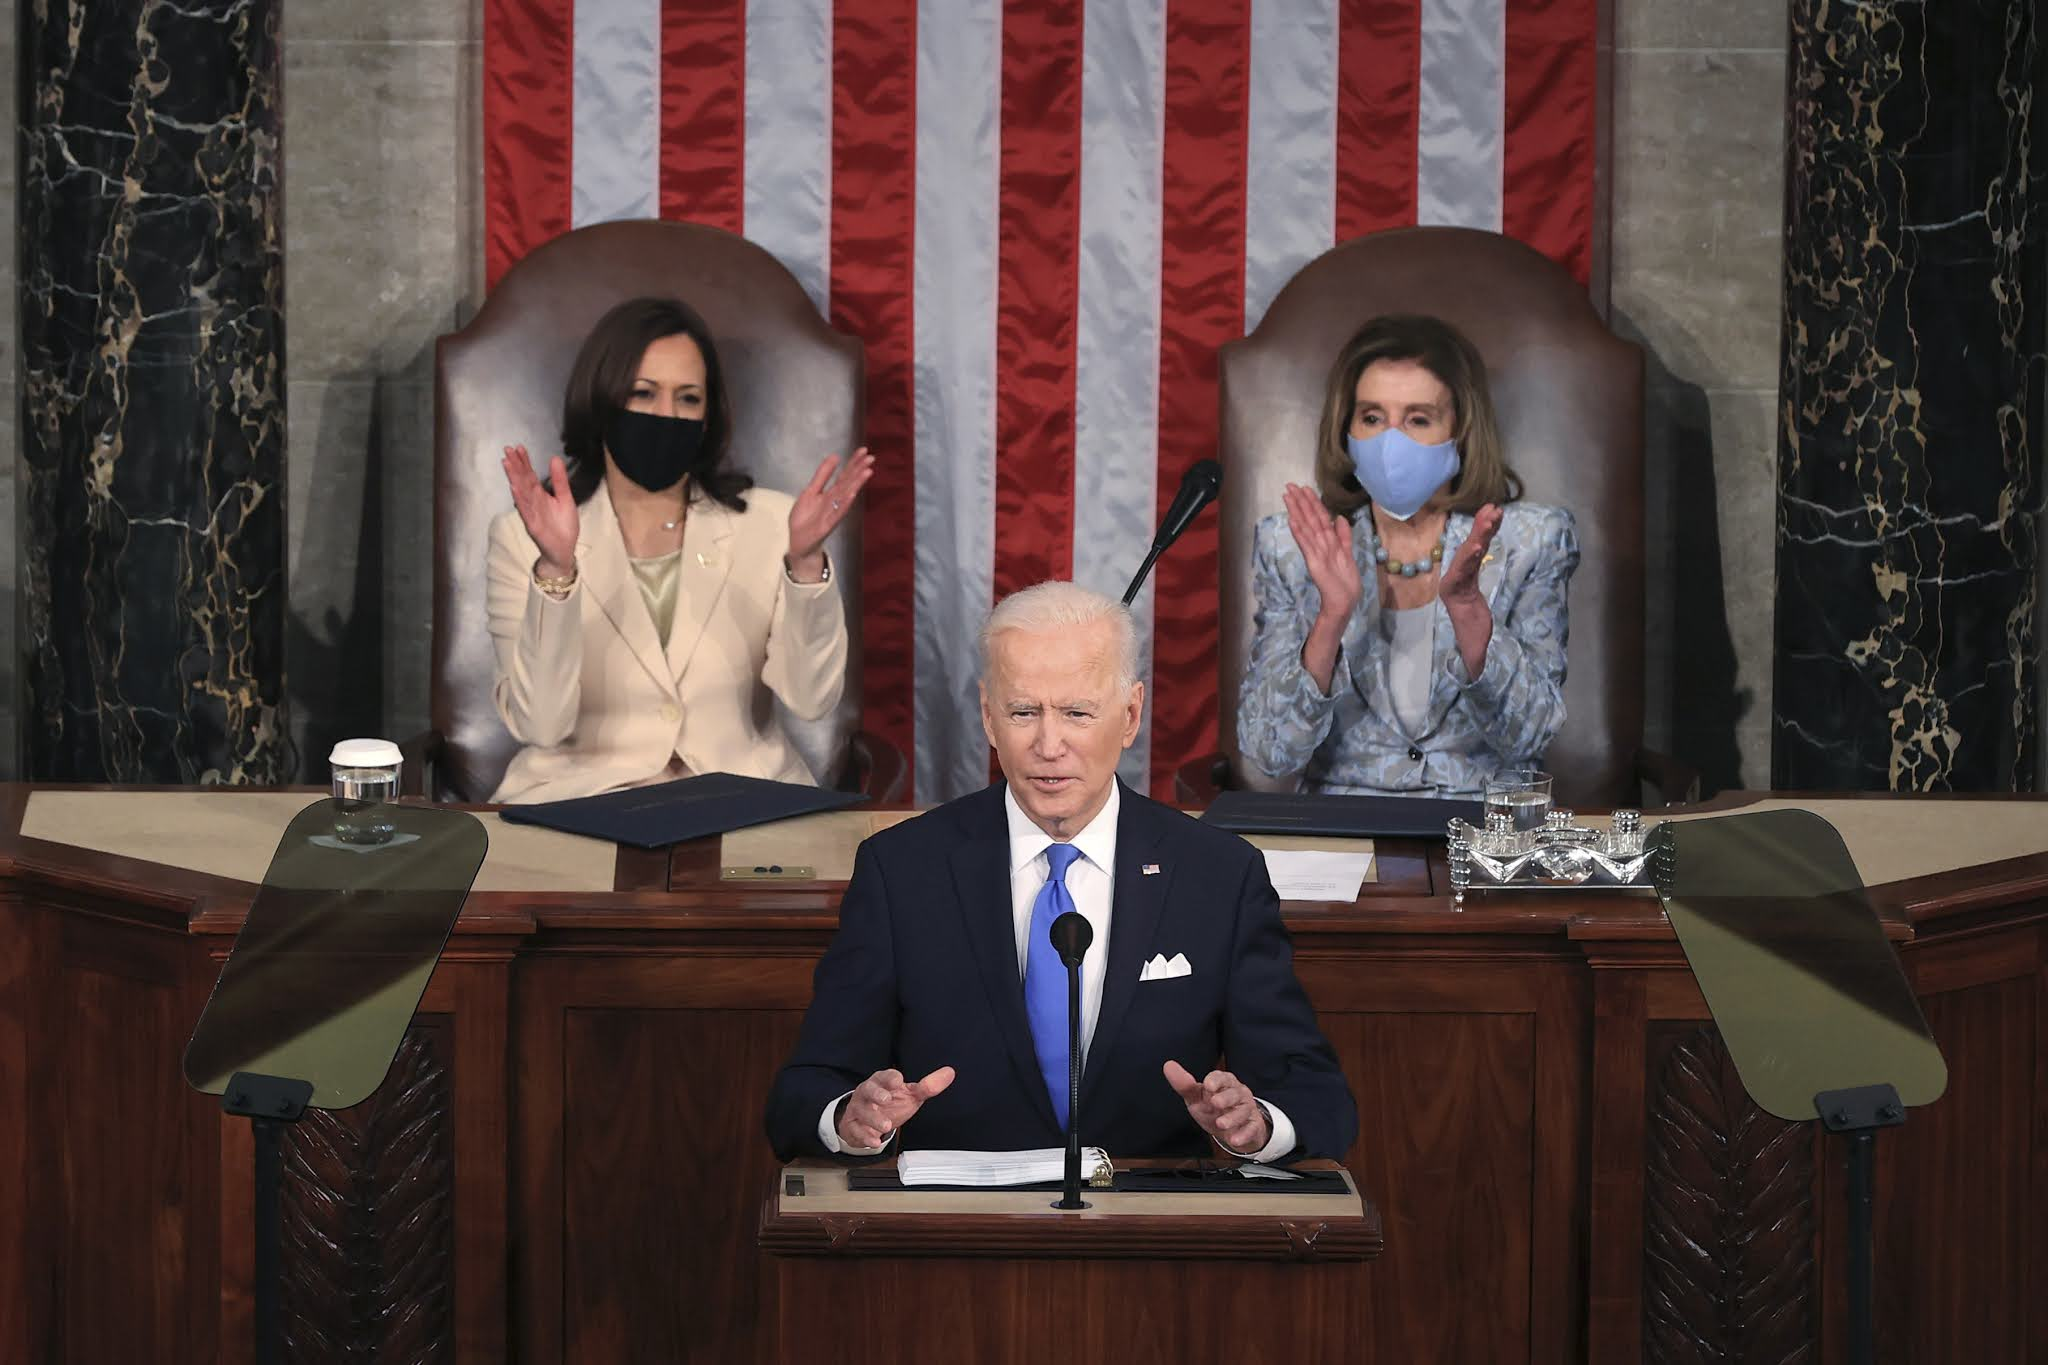 VP Kamala Harris and Nancy Pelosi make history as the first women to lead Senate at US President Joe Biden's first address to Congress (photos)